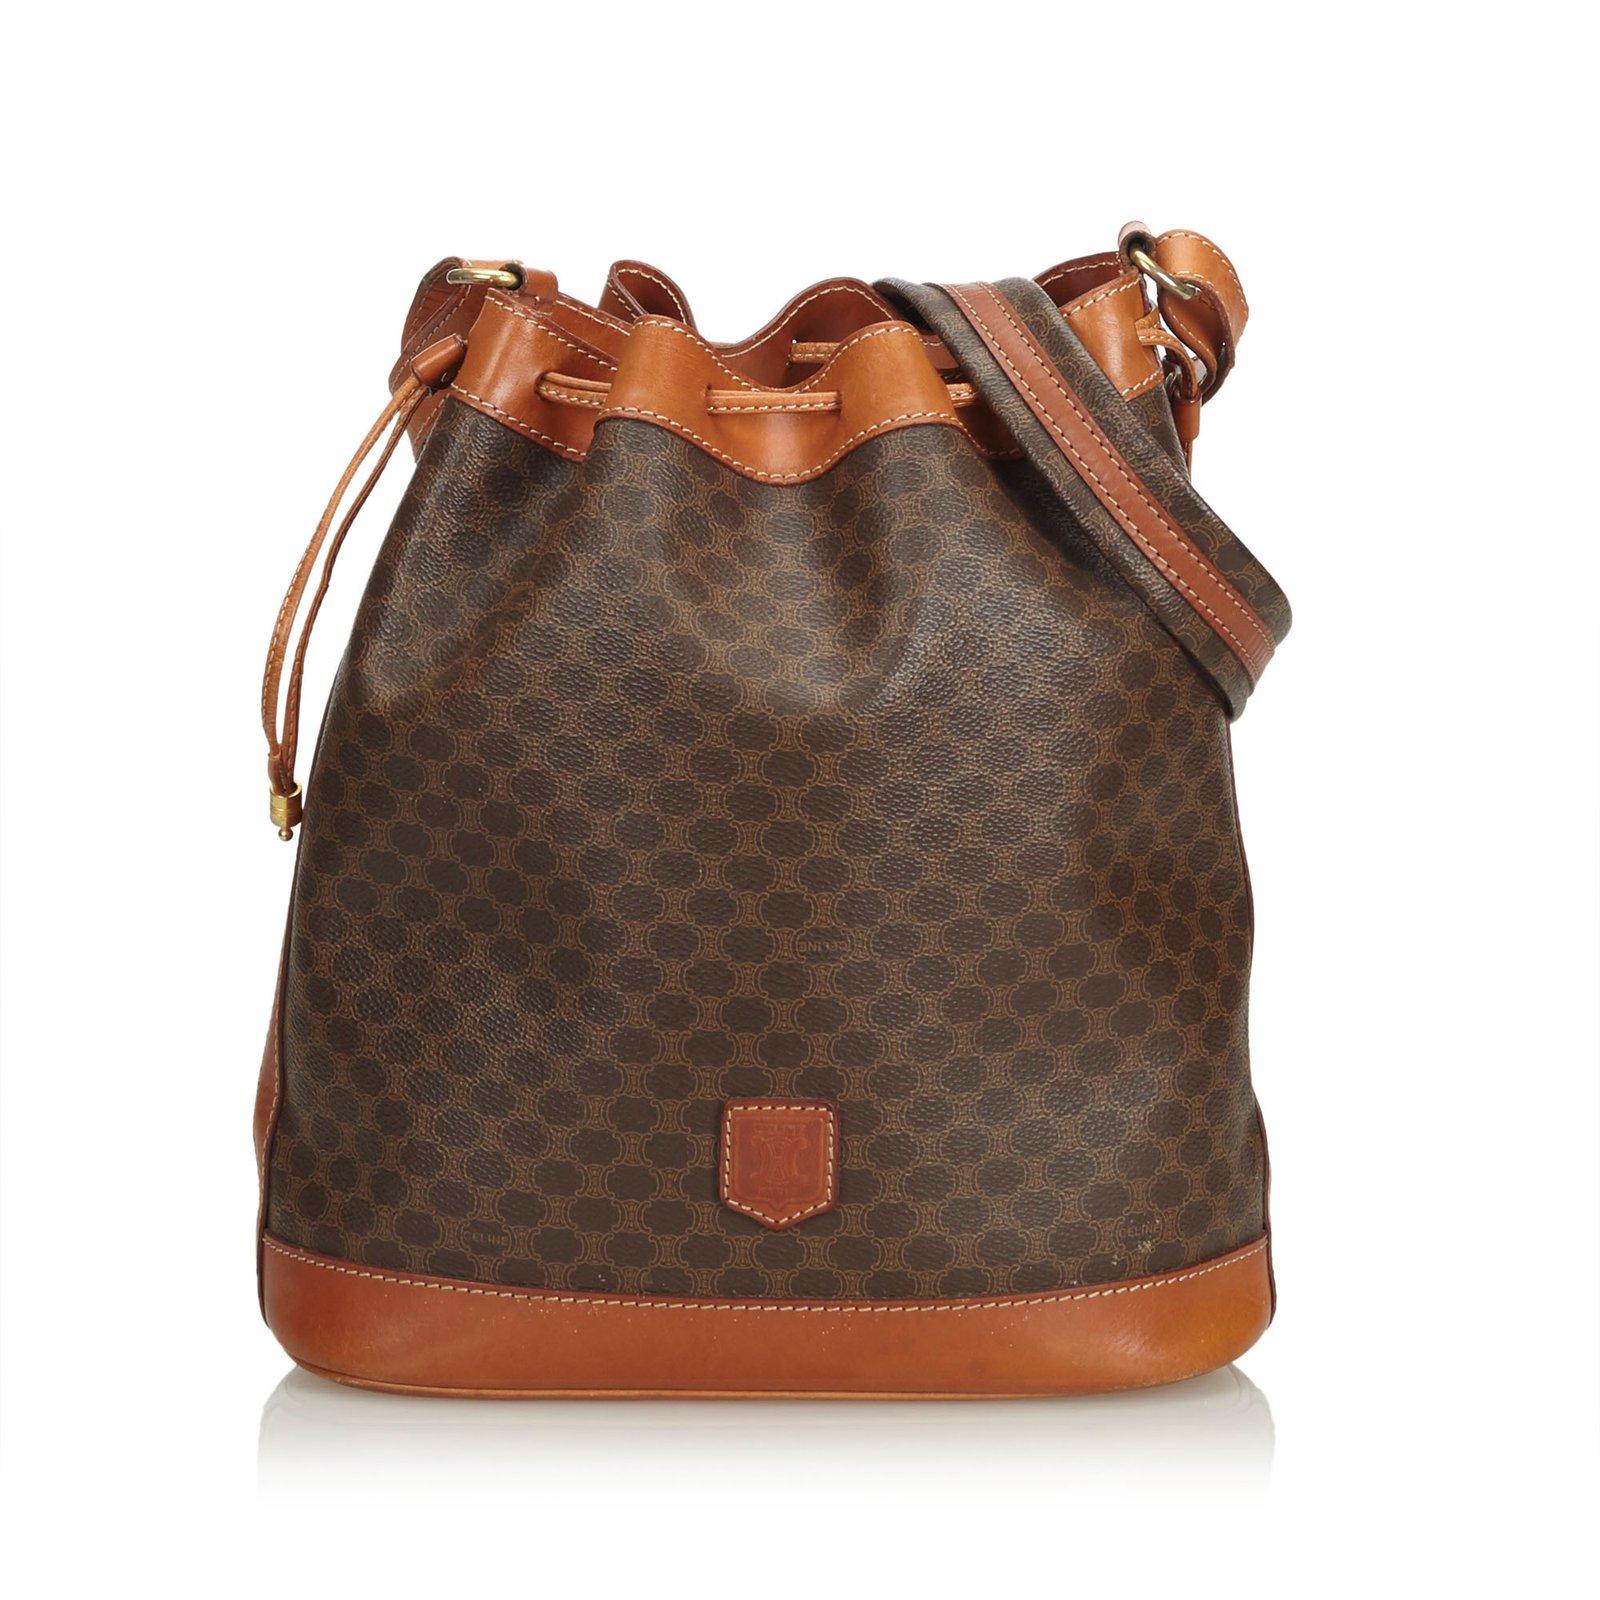 Céline Macadam Drawstring Bucket Bag Handbags Leather 9e06afad5bc78